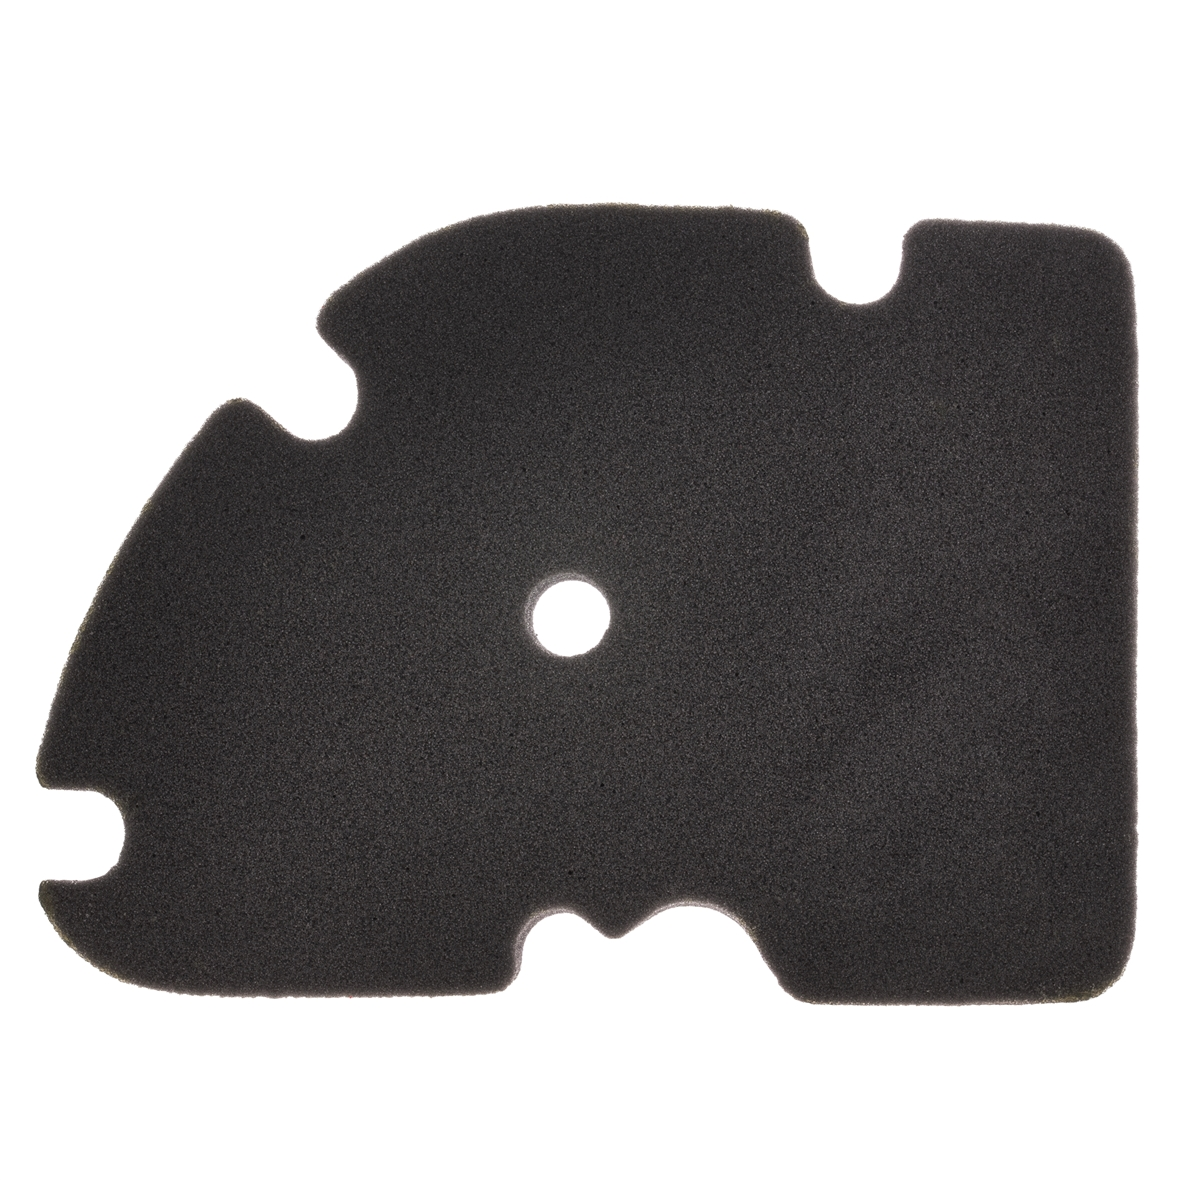 Product Image for 'Air Filter Sponge PIAGGIO PREMIUMTitle'